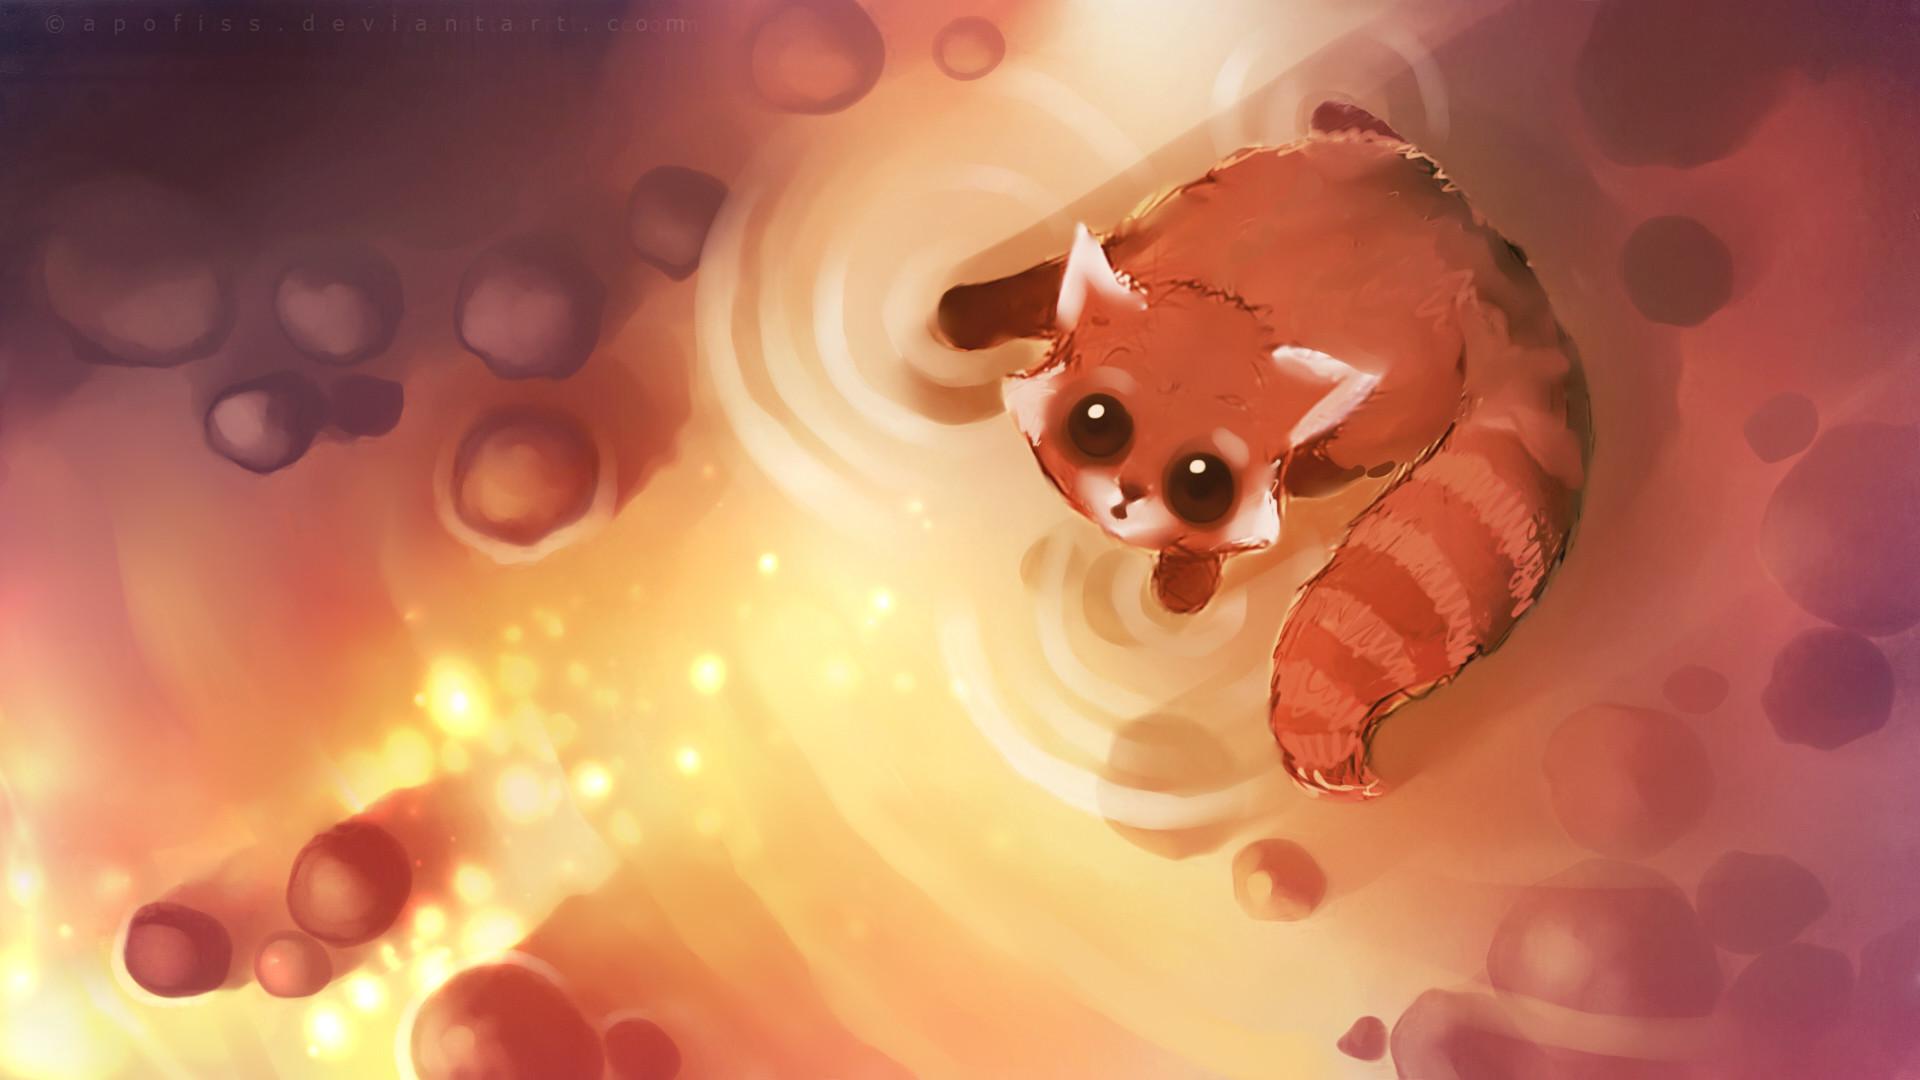 Download Cute Fox Cartoon Wallpaper | HD Wallpapers – #